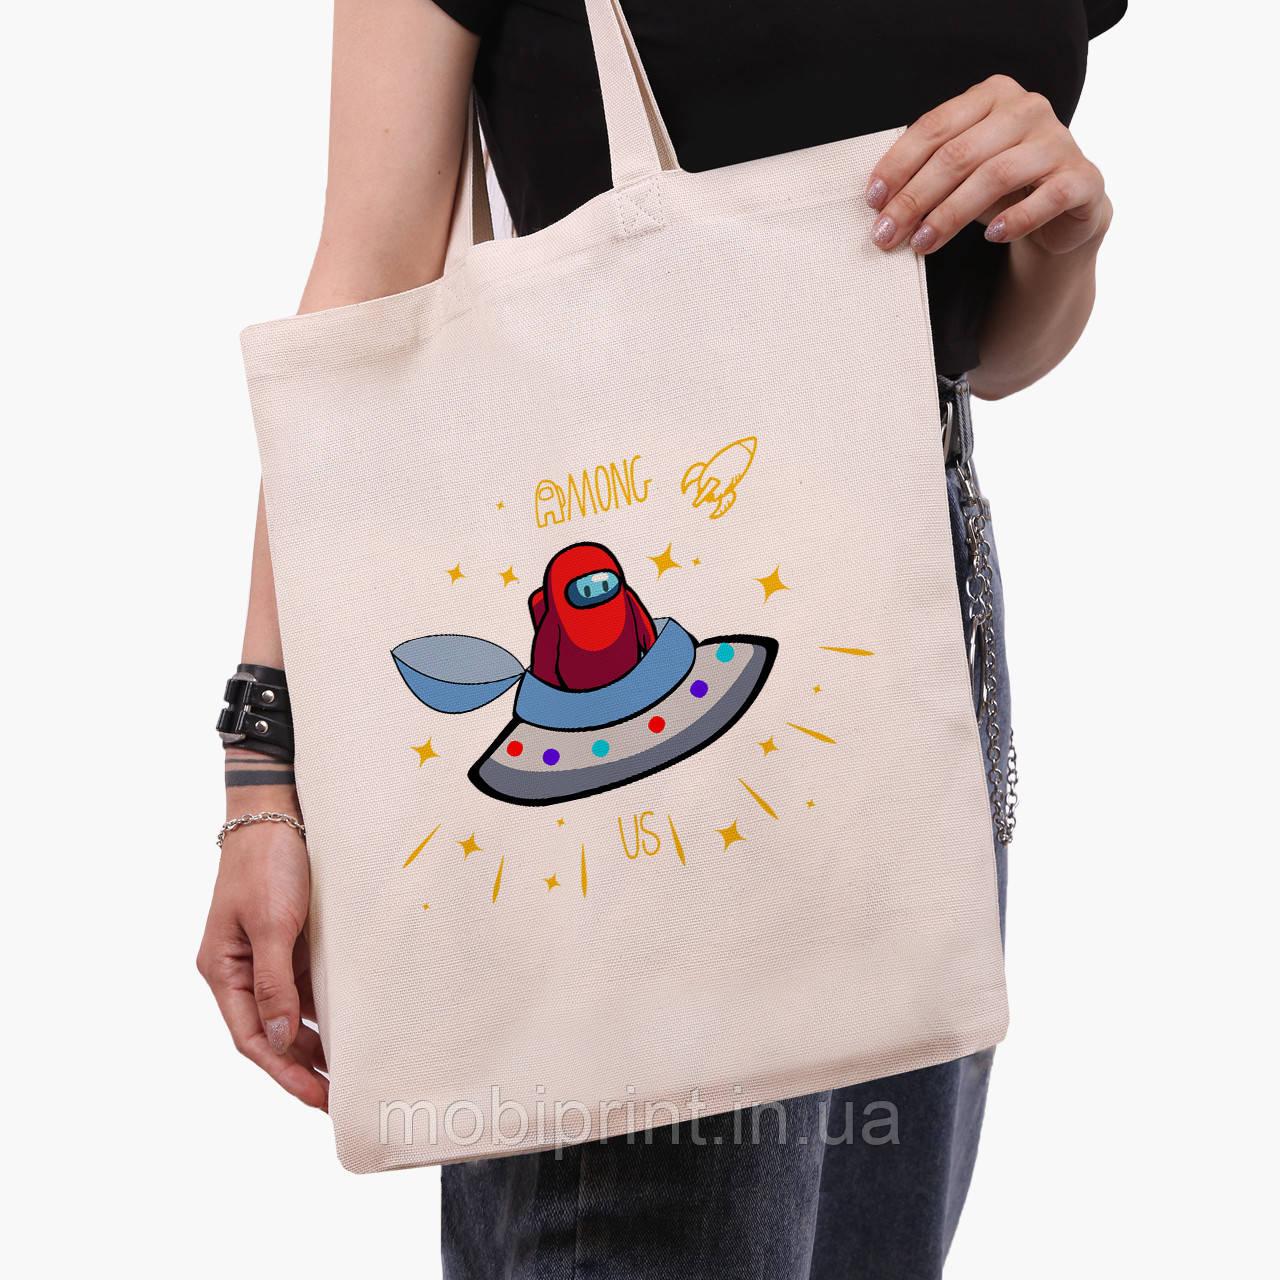 Еко сумка шоппер Амонг Ас (Among Us) (9227-2583) 41*35 см